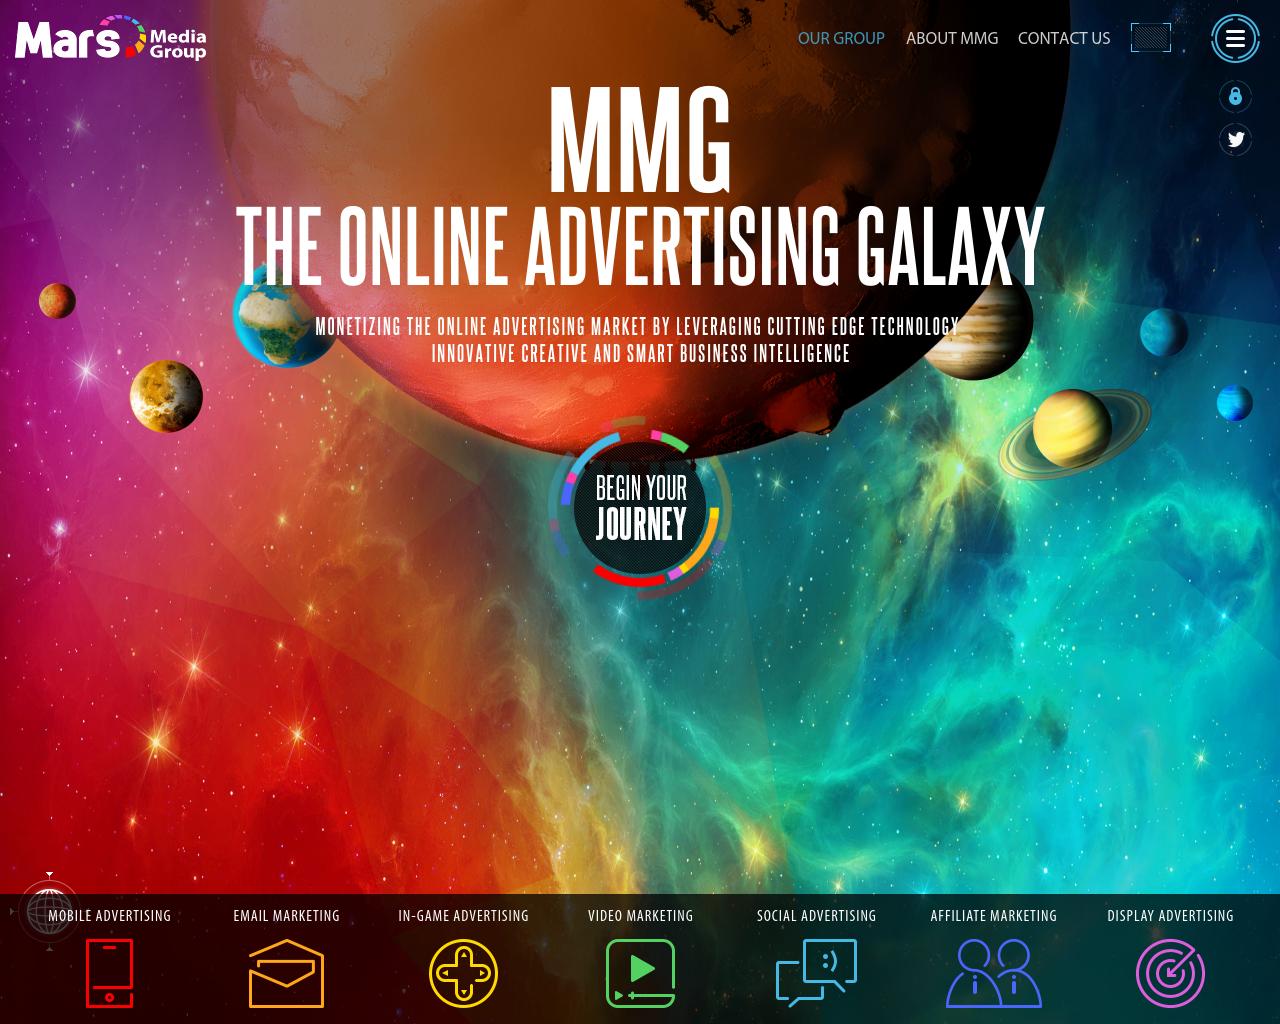 MMG---Mars-Media-Group-Advertising-Reviews-Pricing